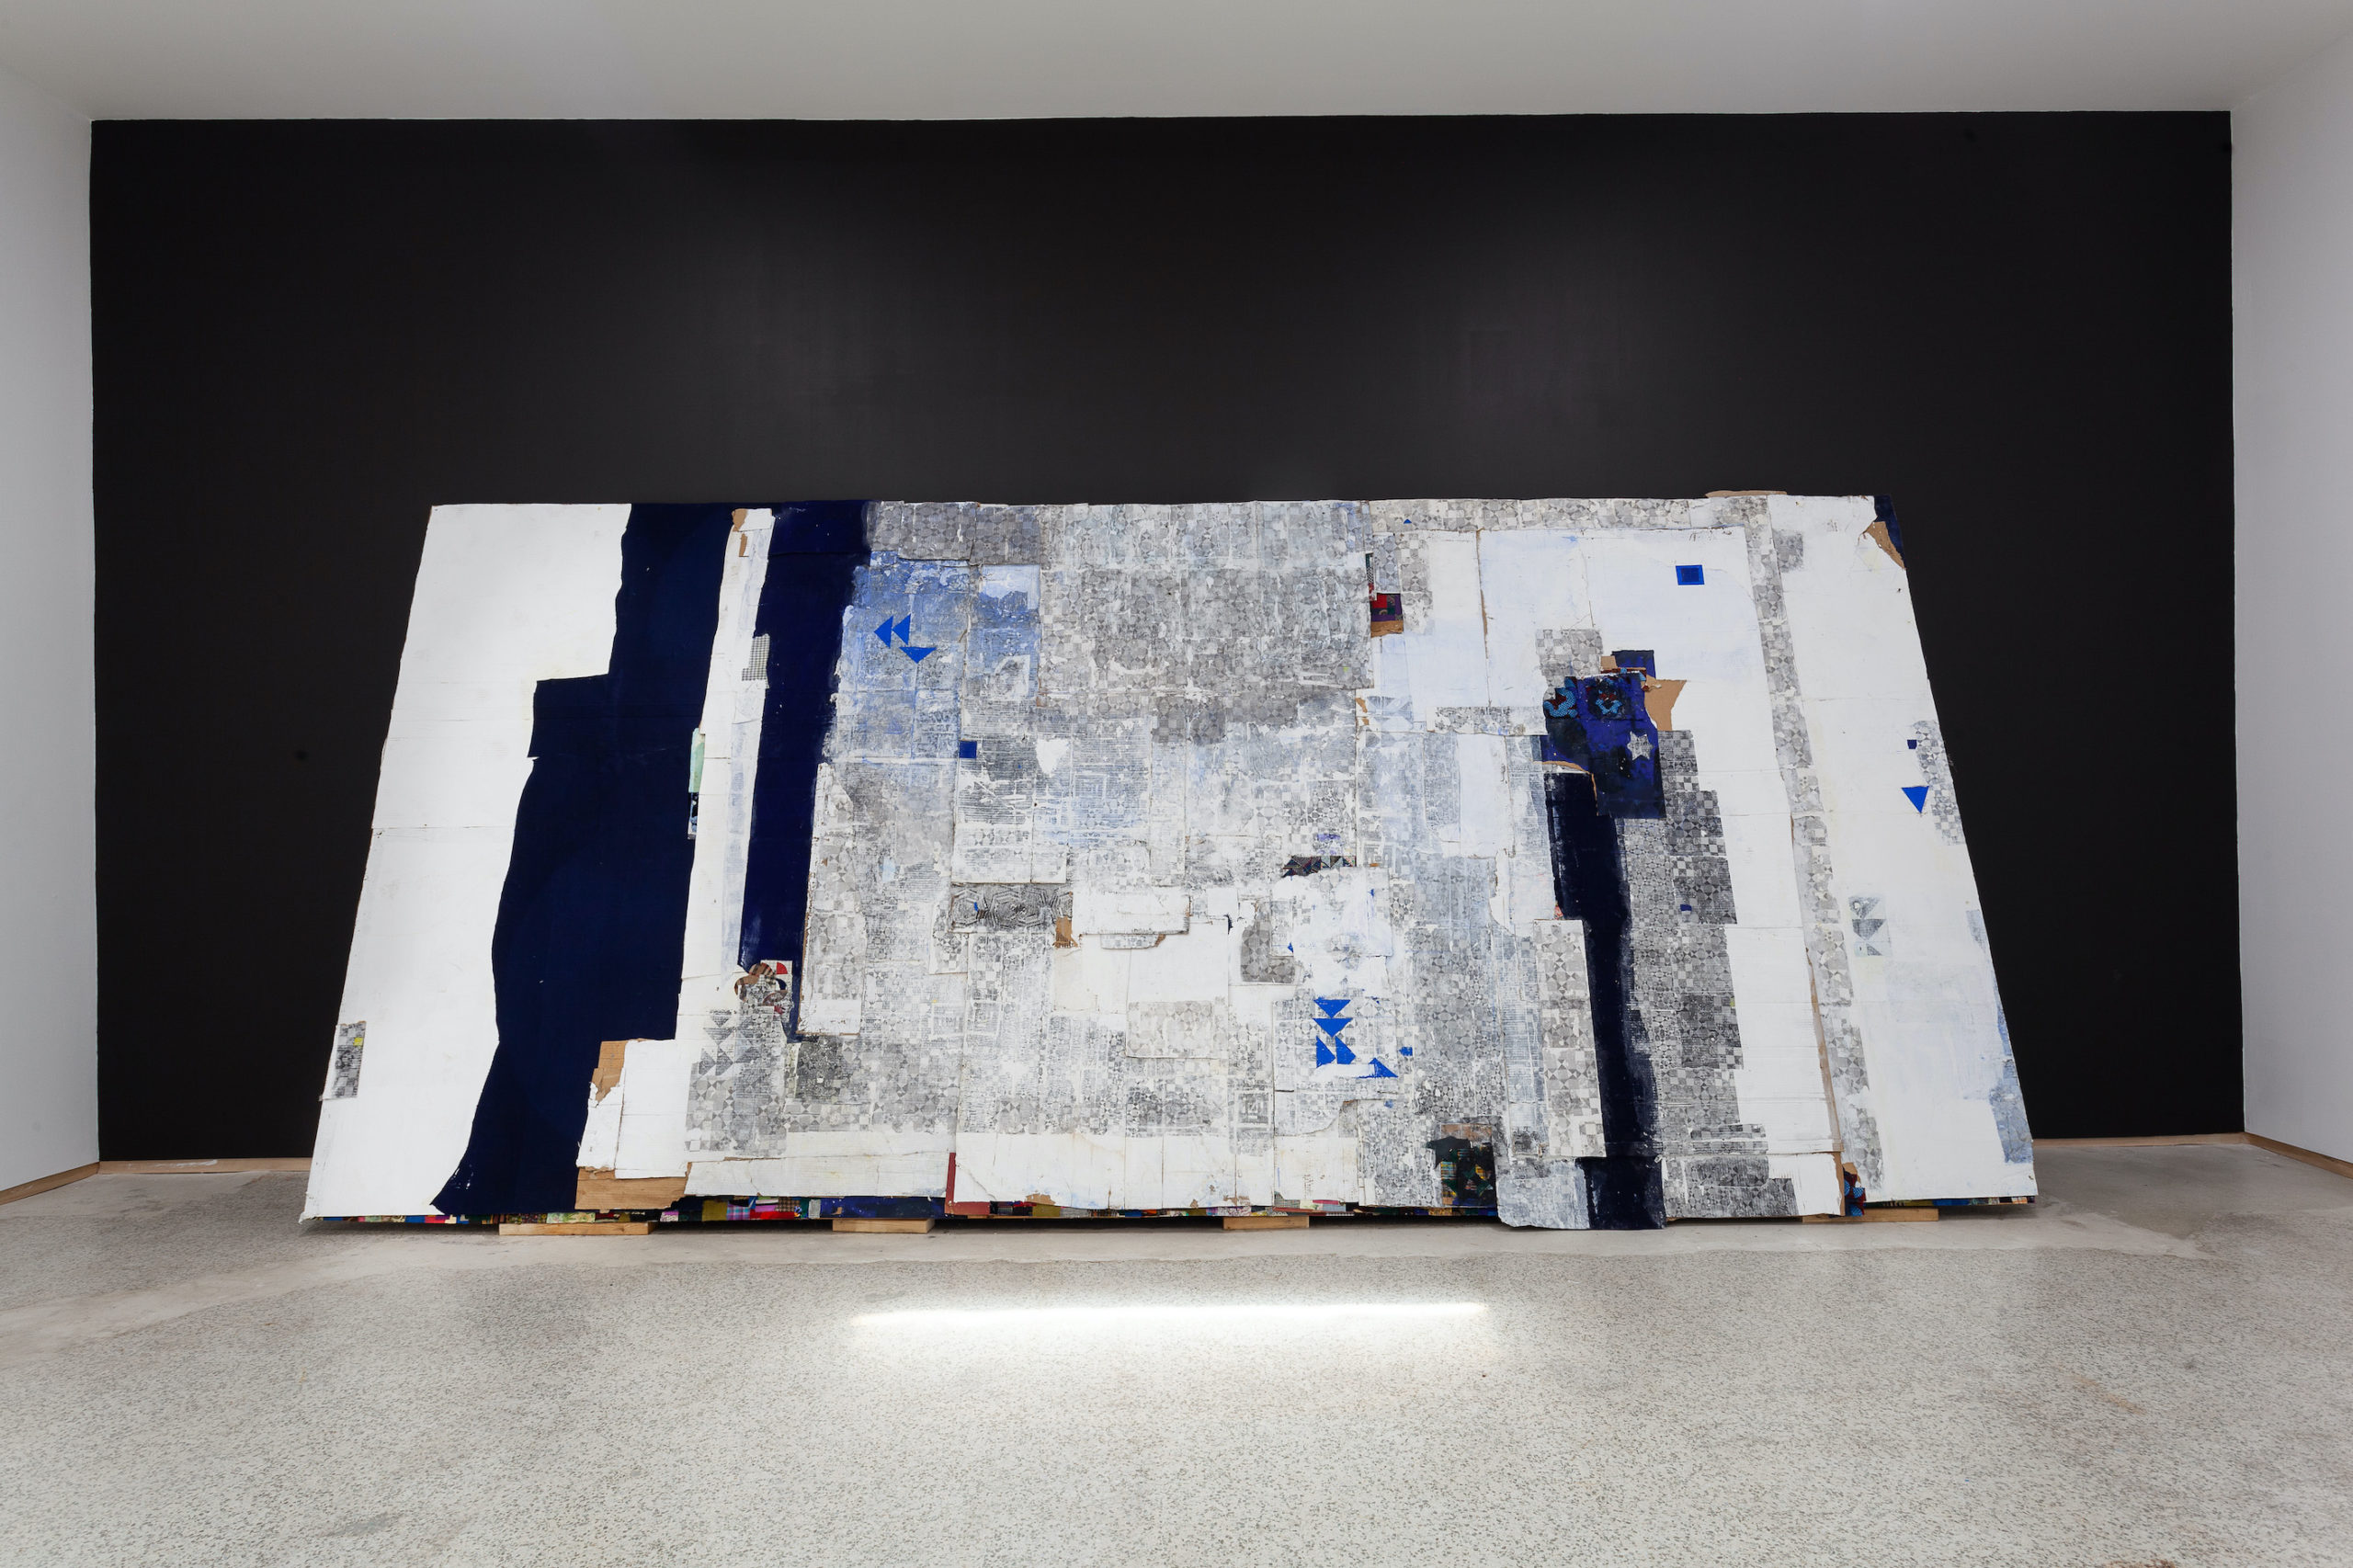 Yanira Collado, Untitled/sumando lineas, 2019